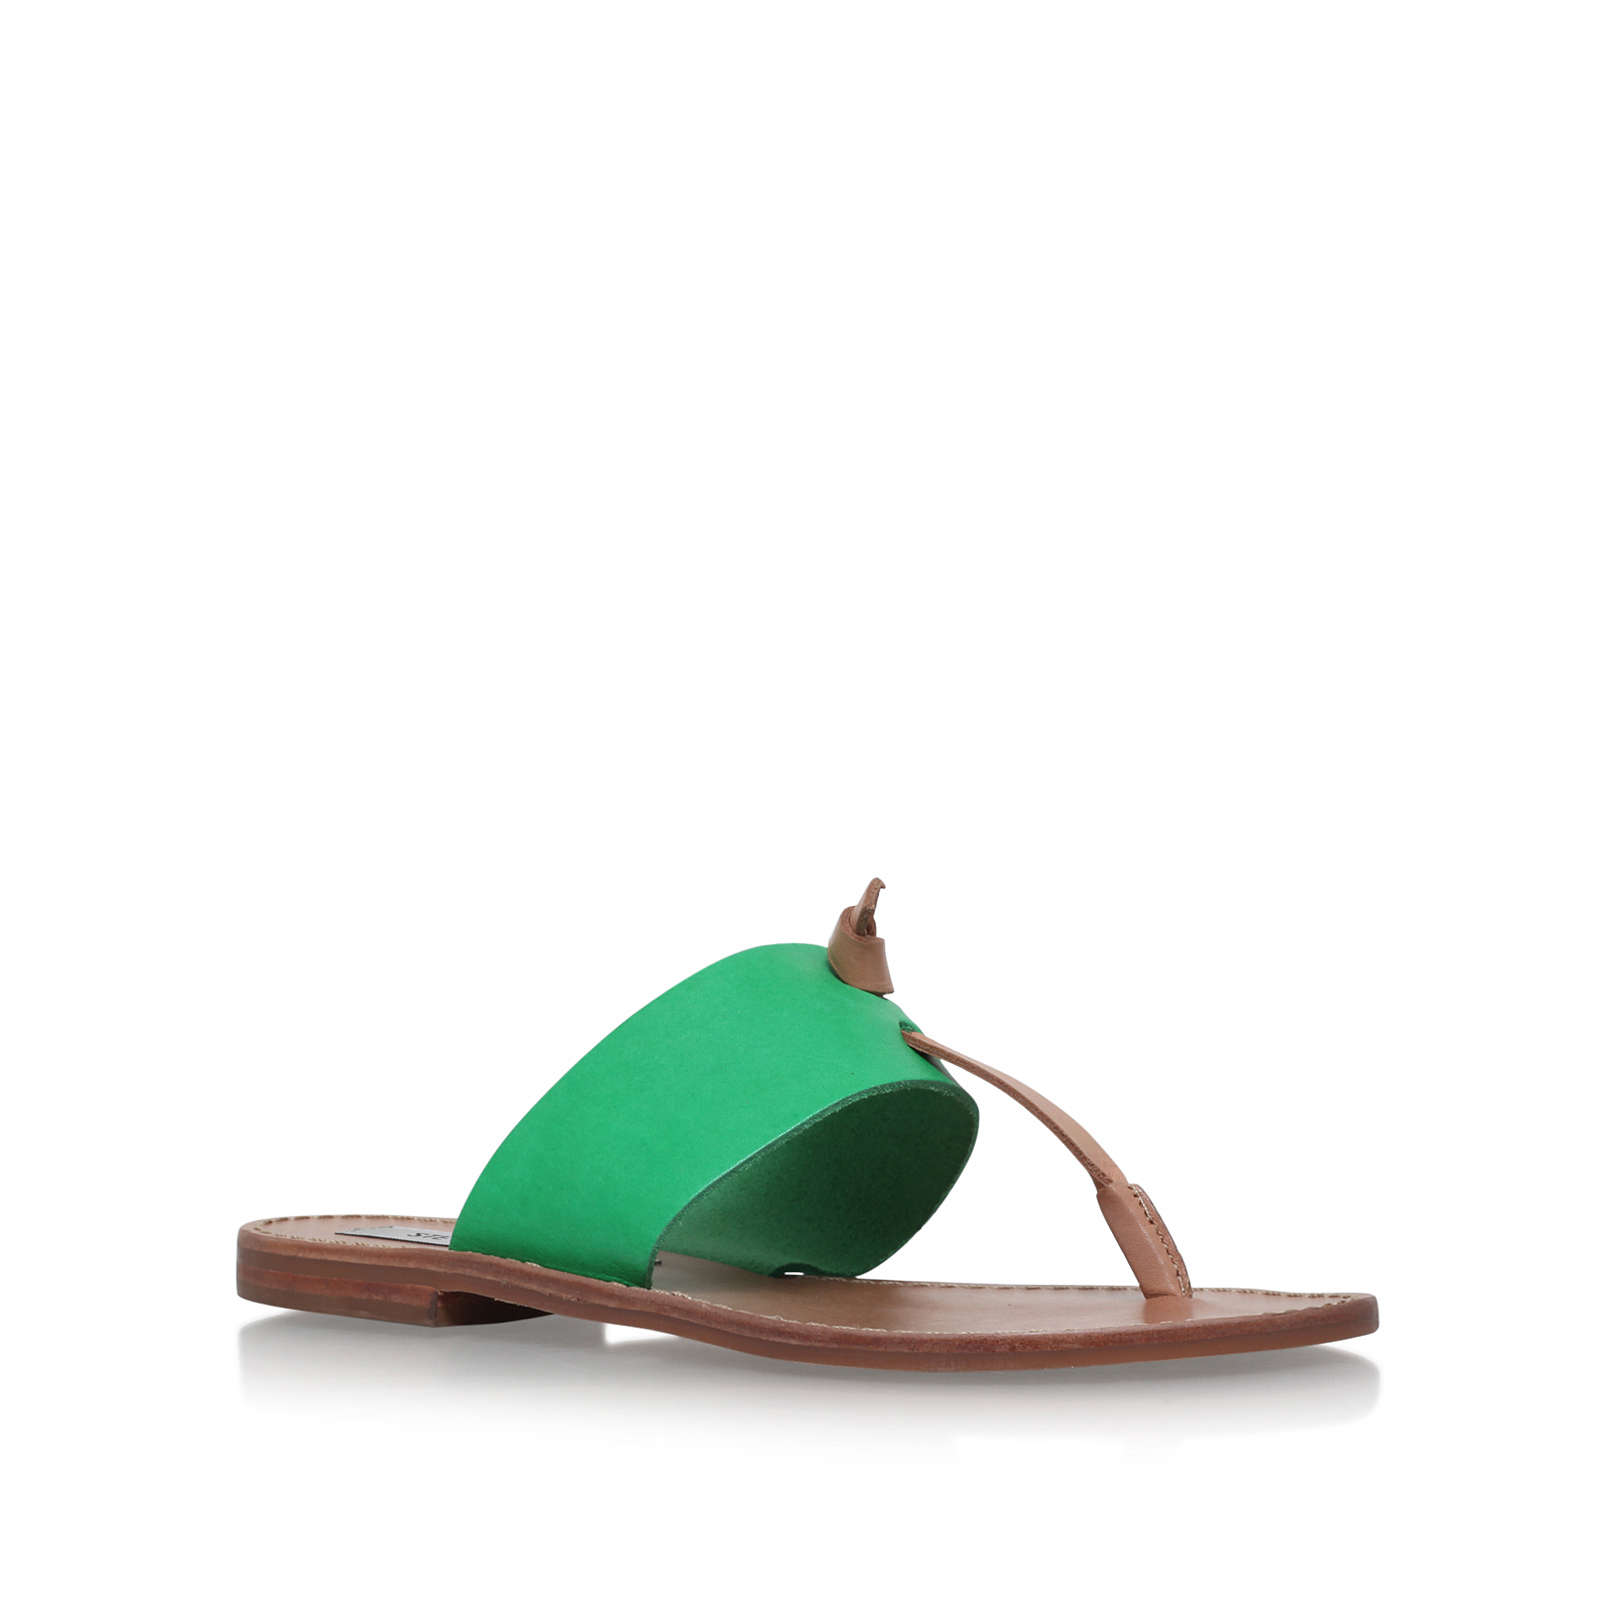 3de418f1109 OLIVIA Steve Madden Olivia Green Leather Flat Sandals by STEVE MADDEN